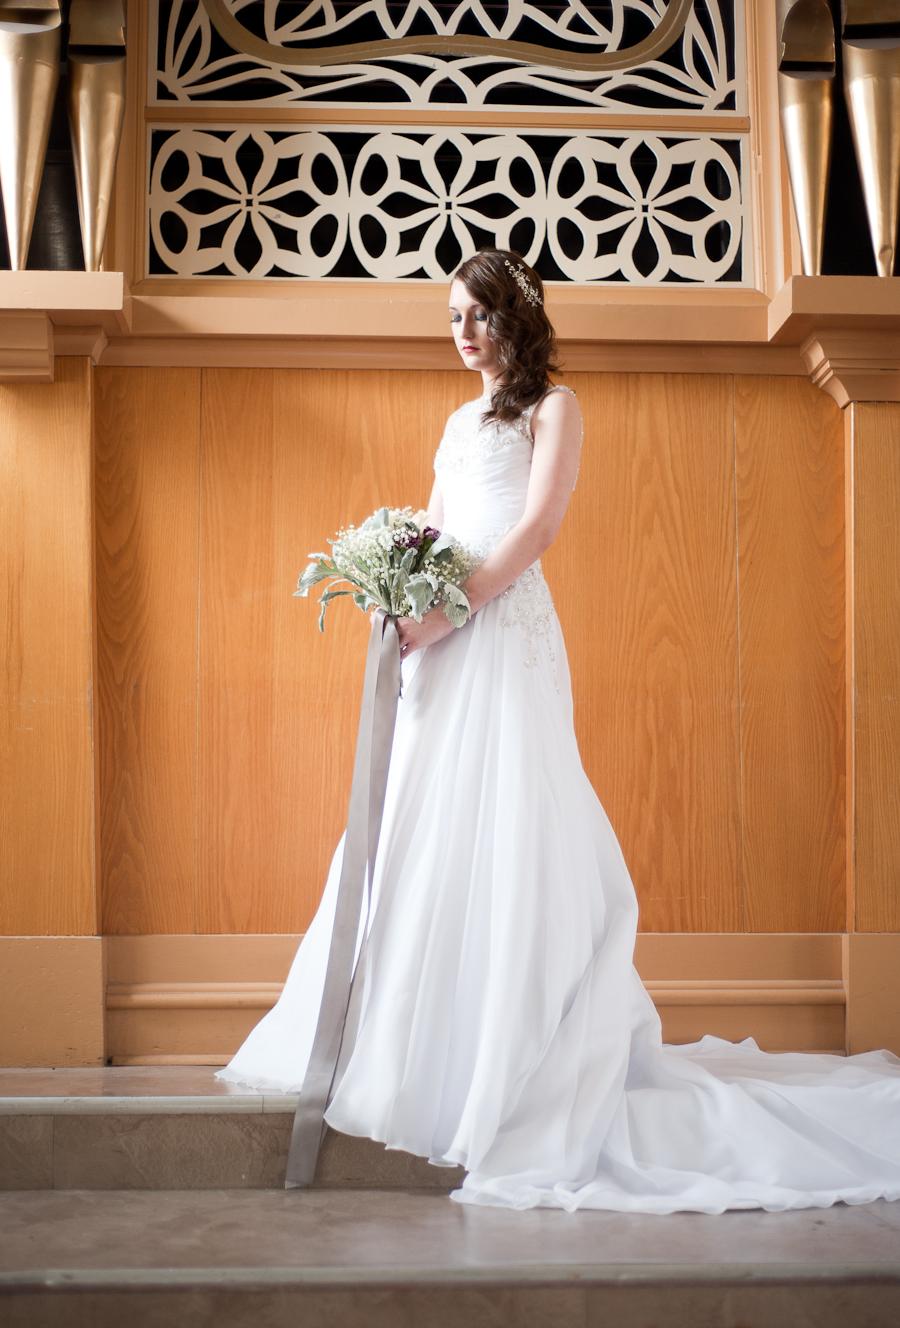 Susannah_Deangelo_Antique_Silver_Music_Hall_Wedding-43.jpg